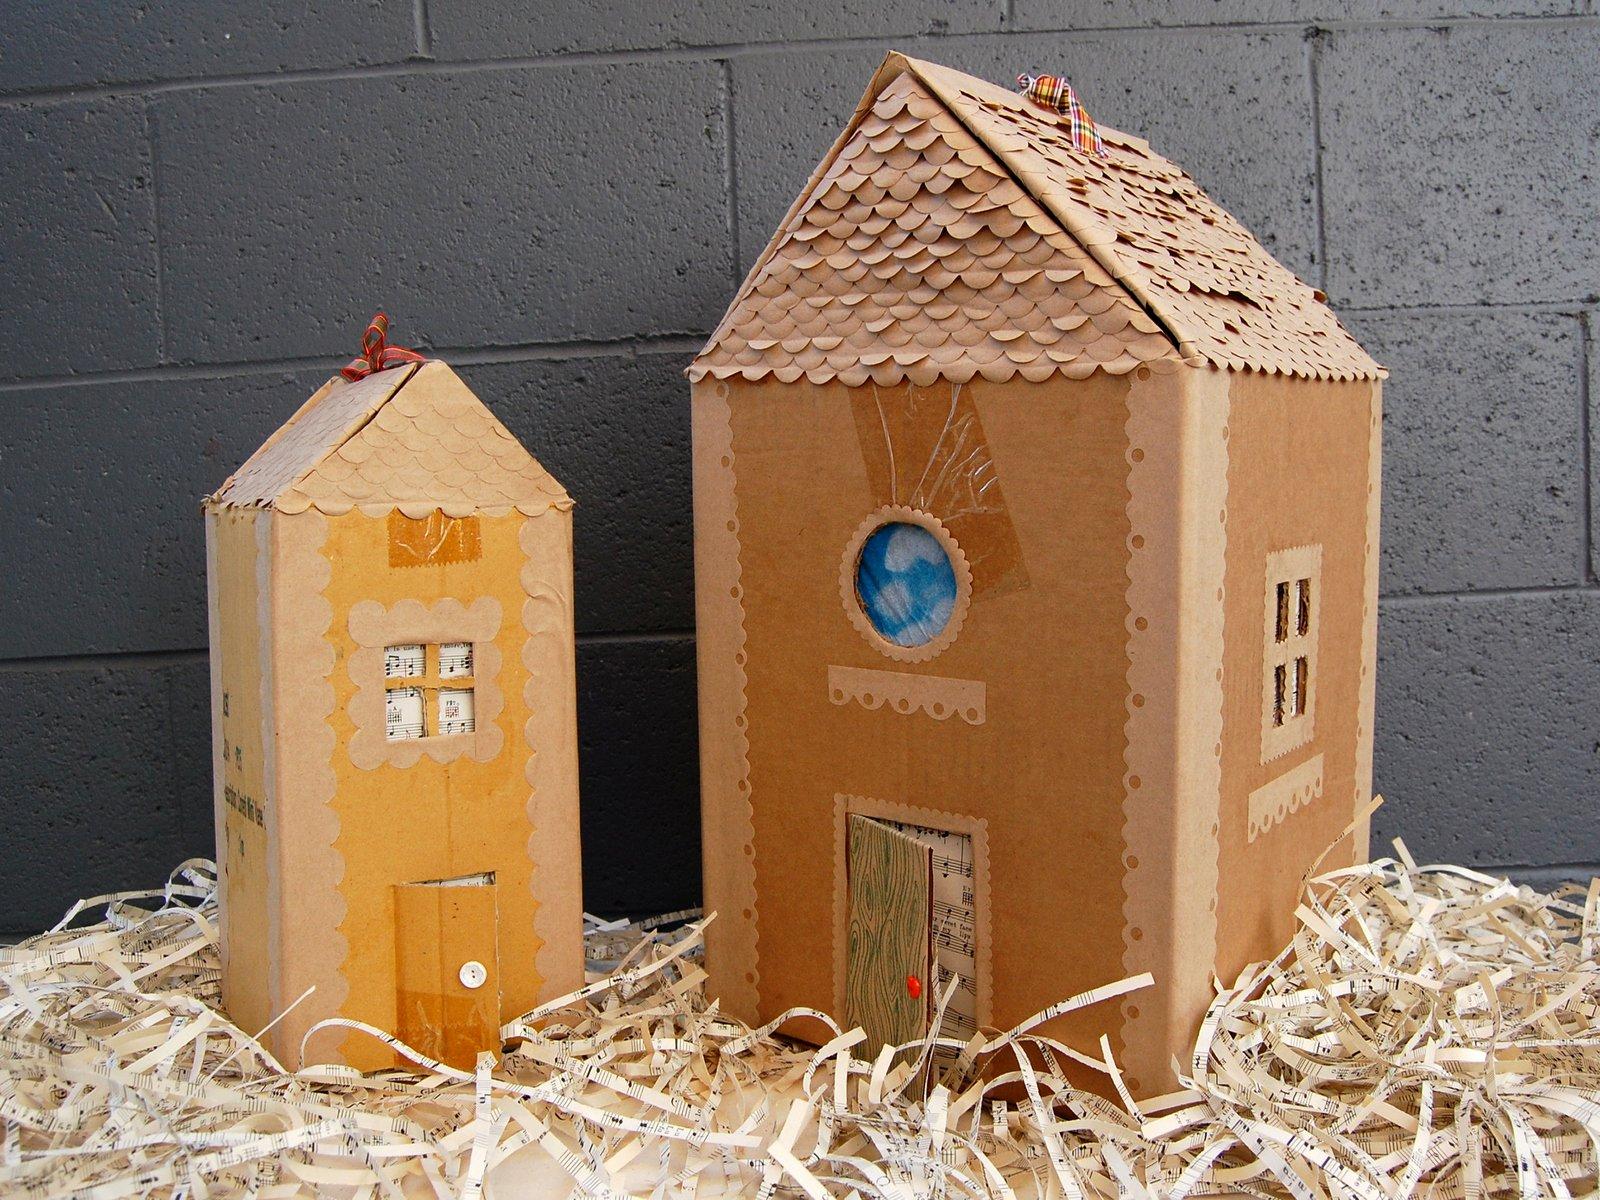 Cardboard Gingerbread House Awesome Cardboard Cuties